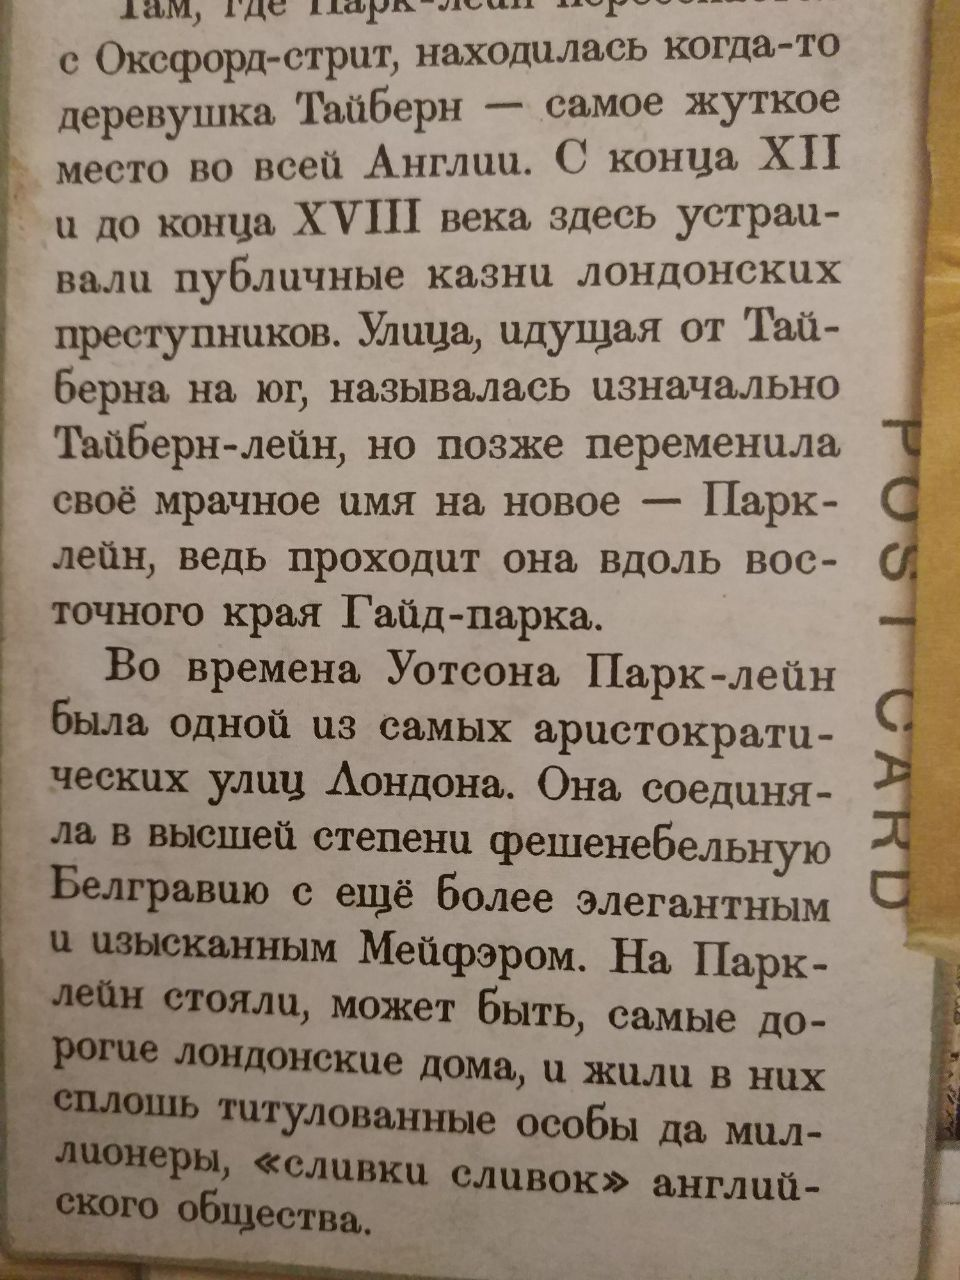 http://s7.uploads.ru/otfku.jpg